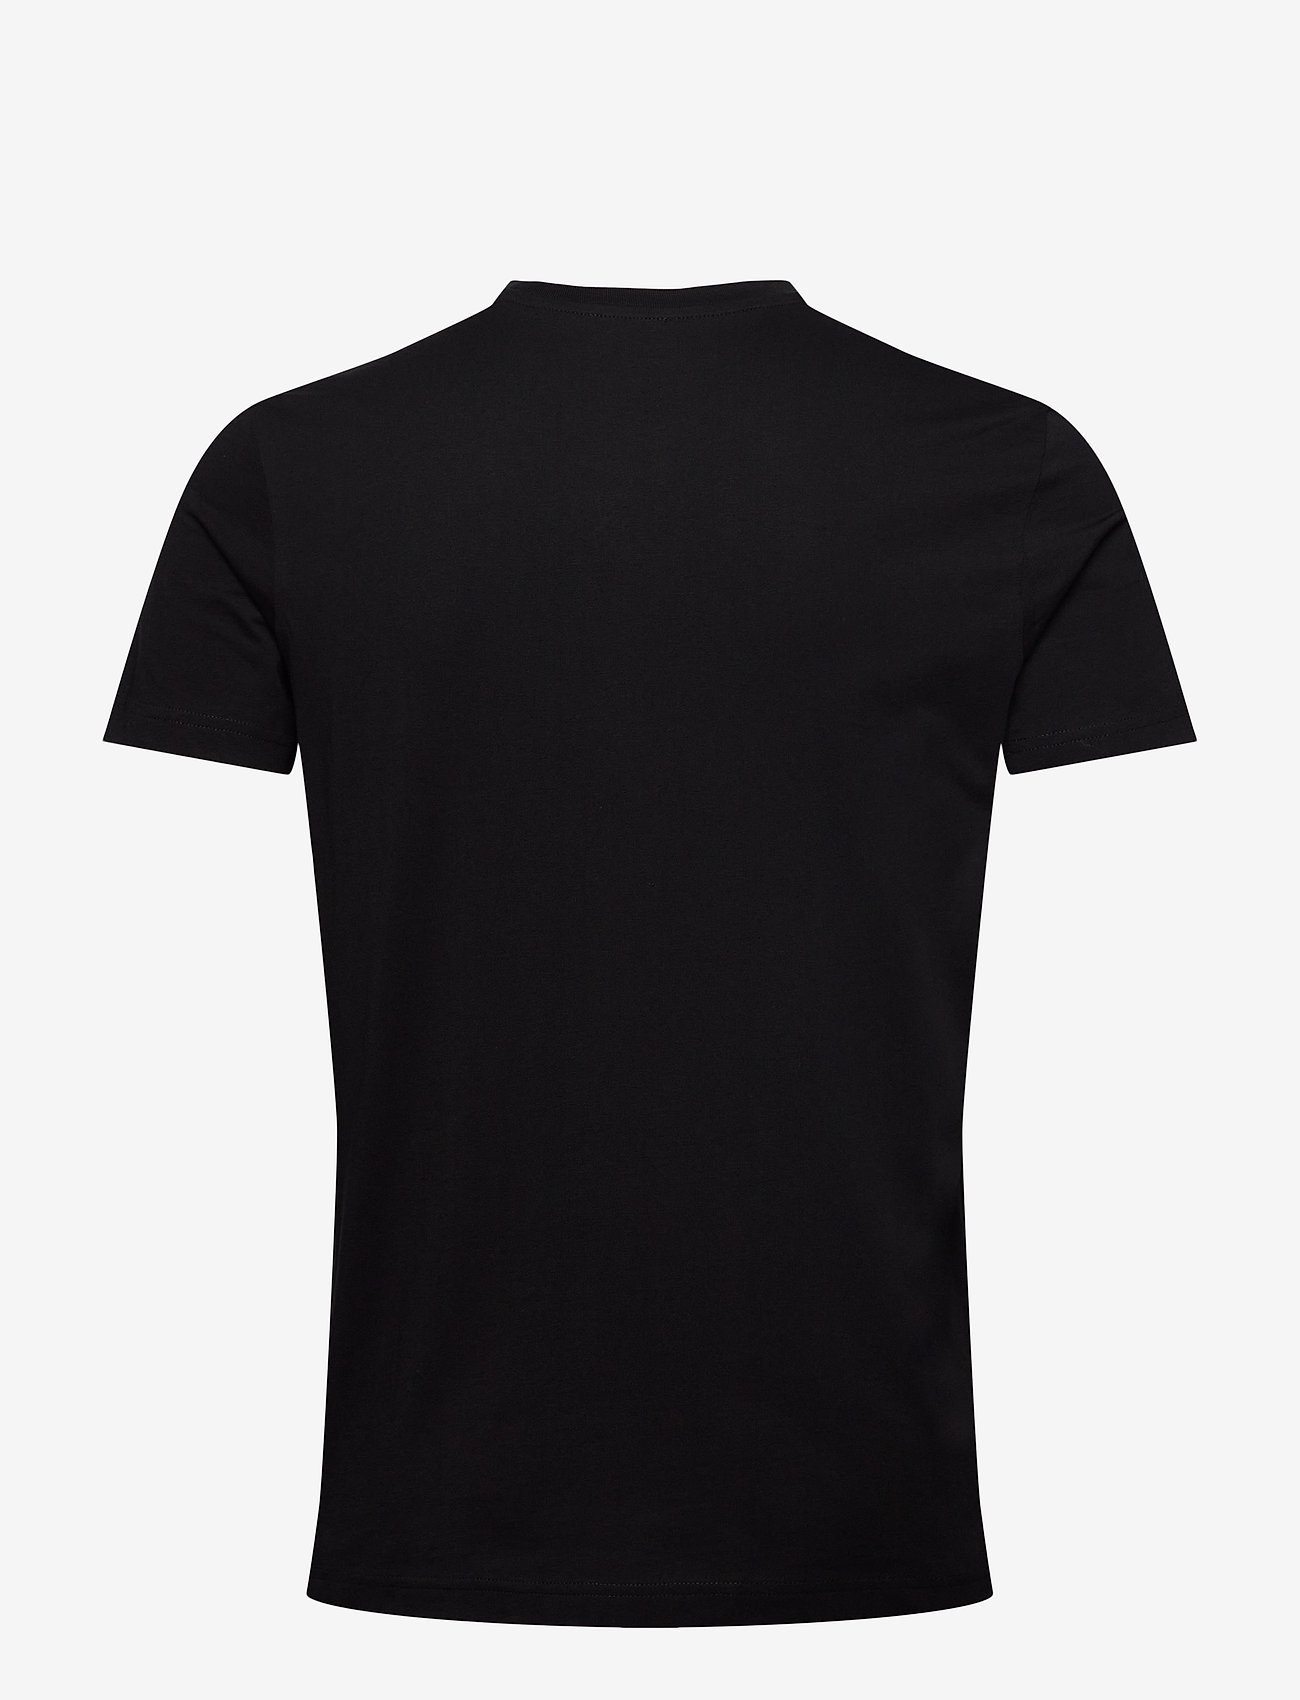 Diesel Men - T-DIEGOS-K36 T-SHIRT - basic t-shirts - black - 1